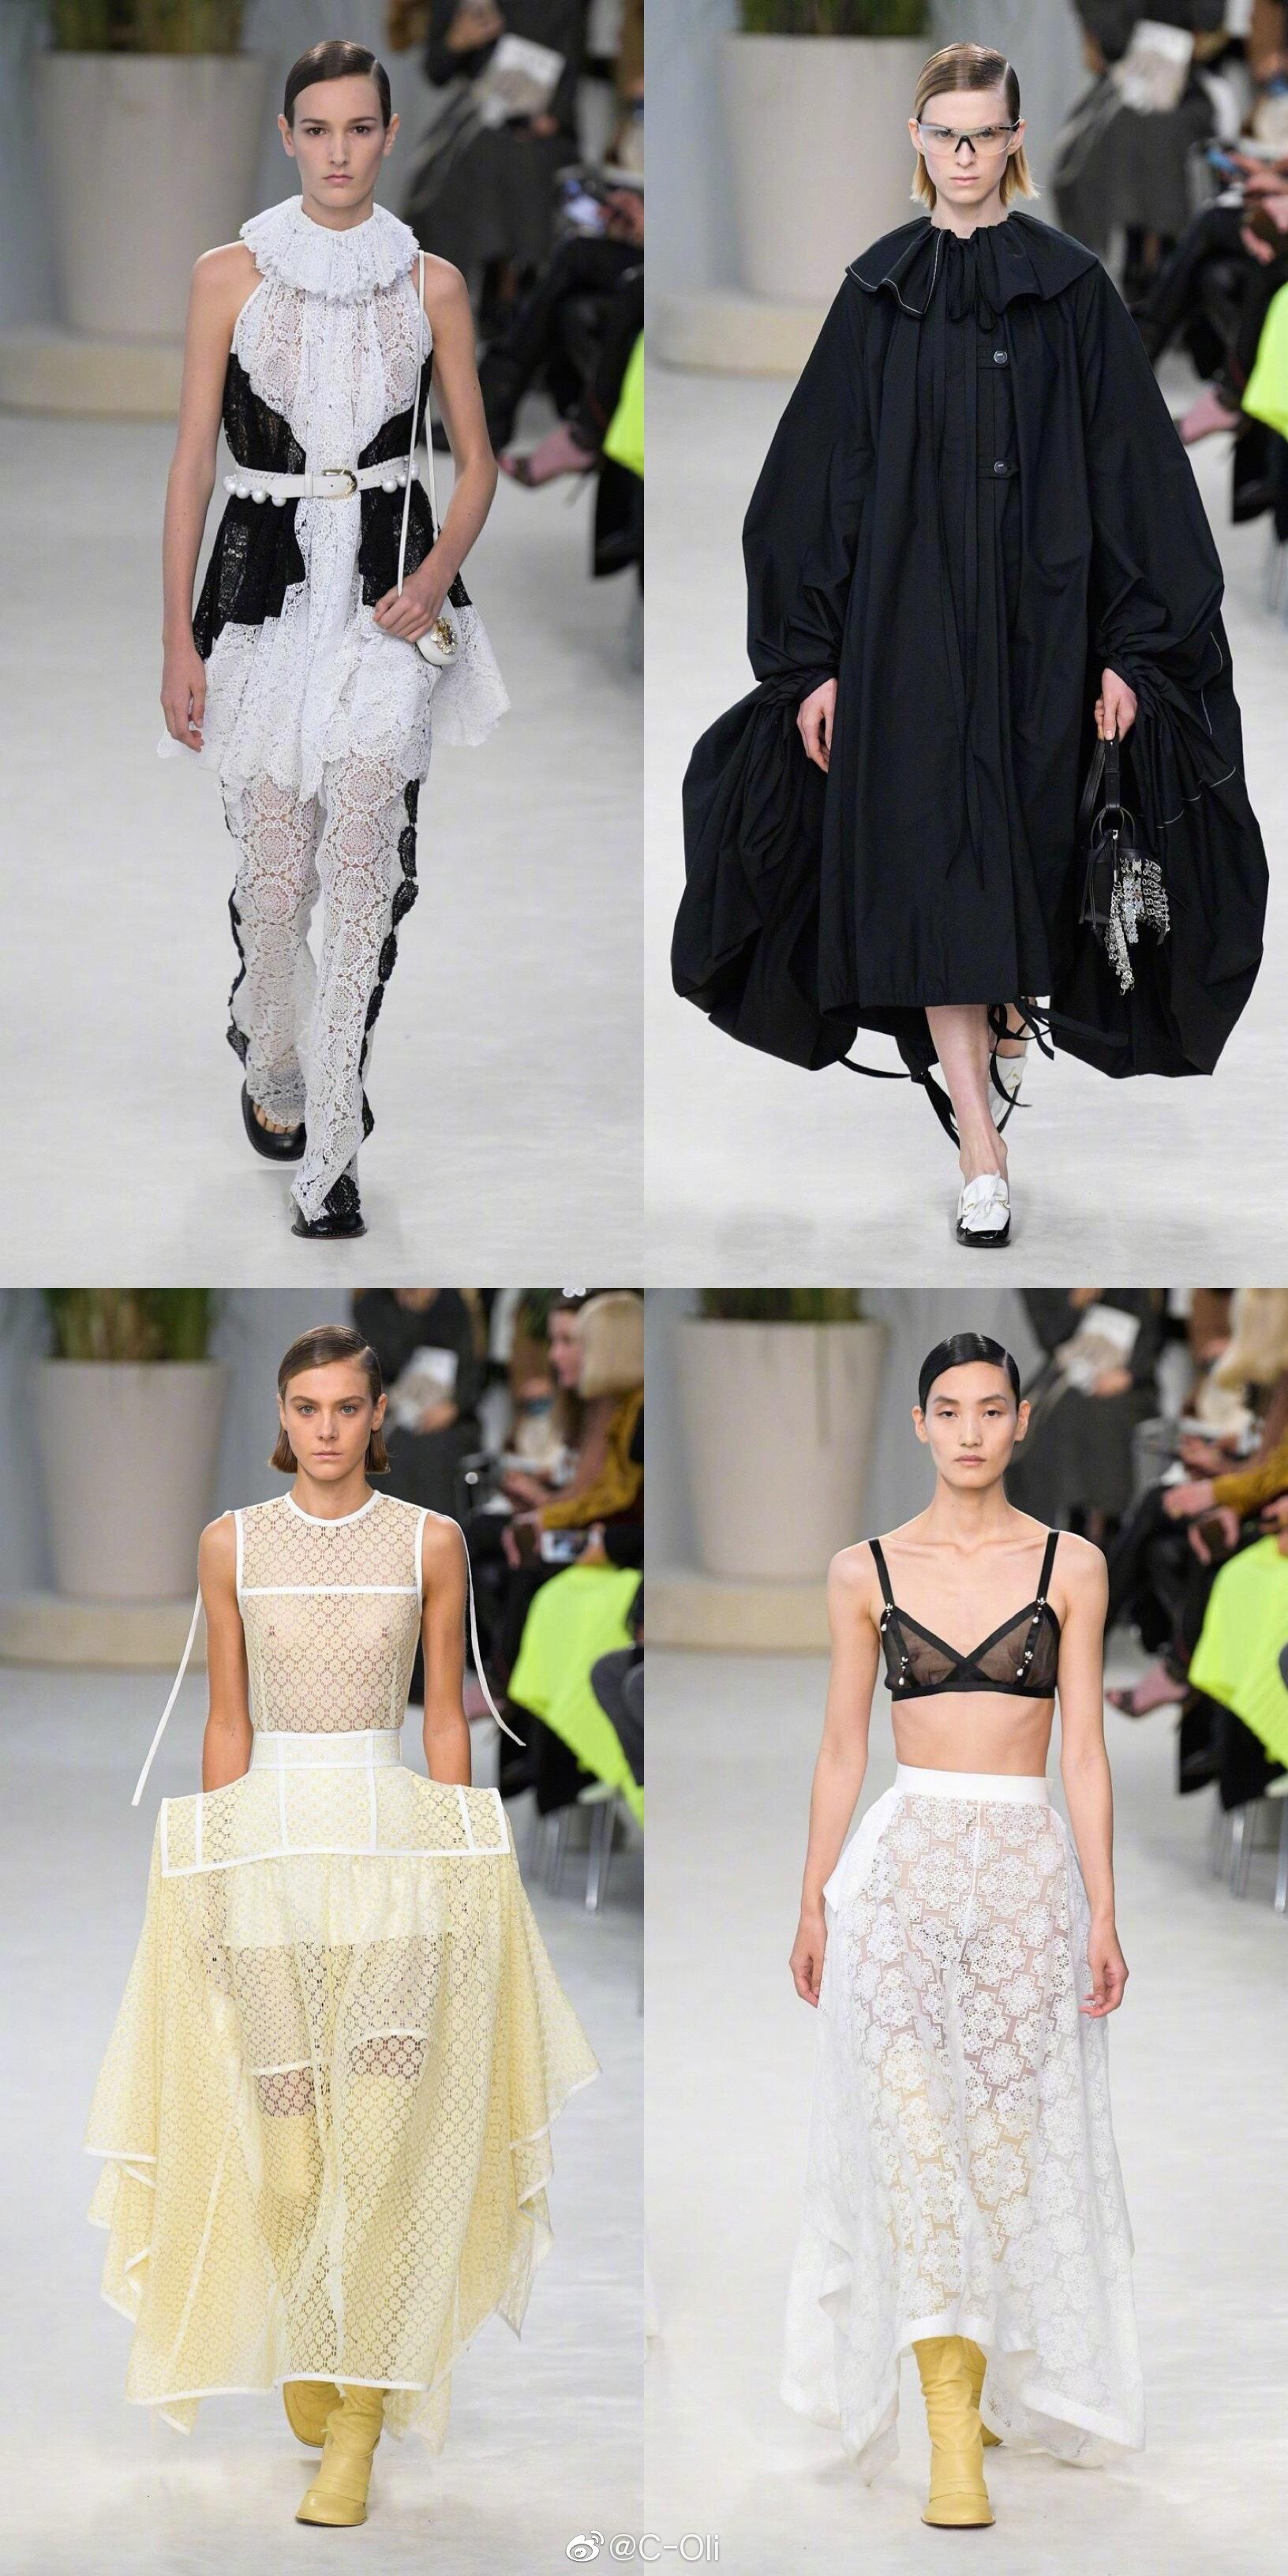 LOEWE S/S 2020  ||  大量蕾丝、薄纱、镂空以及透视元素的运用让这一